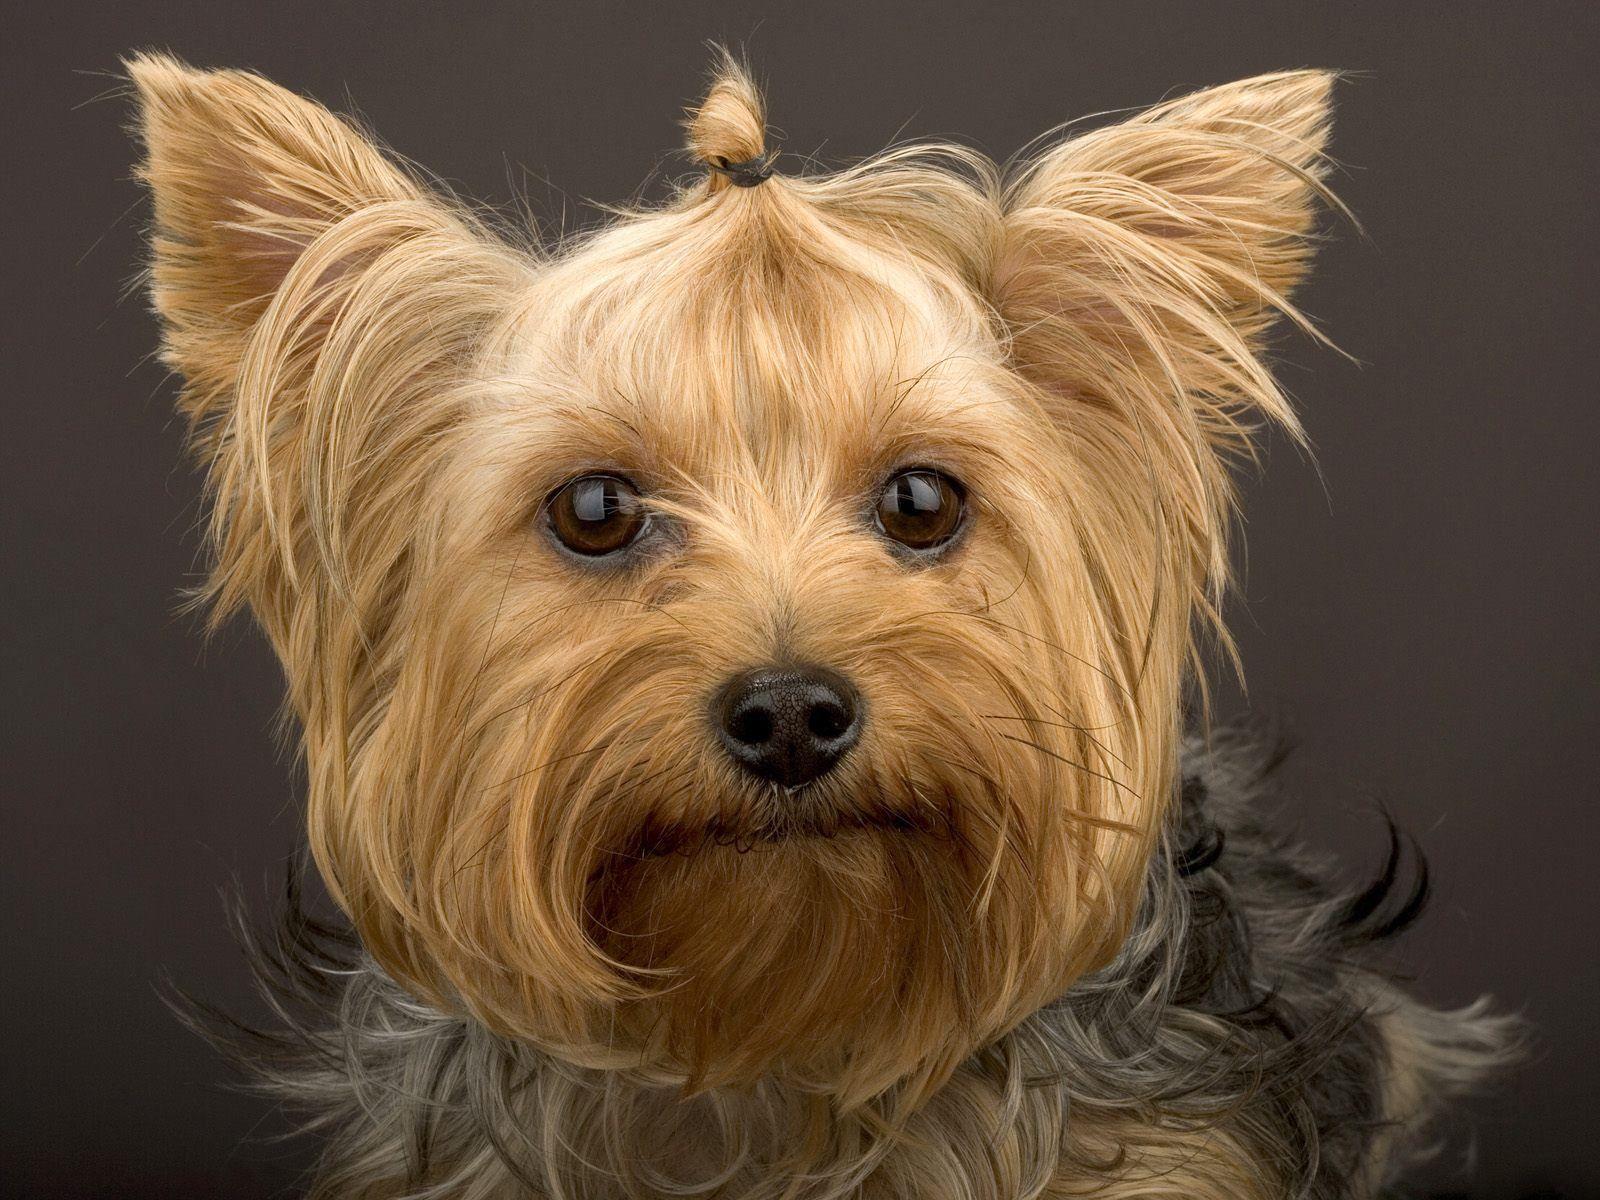 Minus the hair tie this cute dog looks like Gizmo Cute